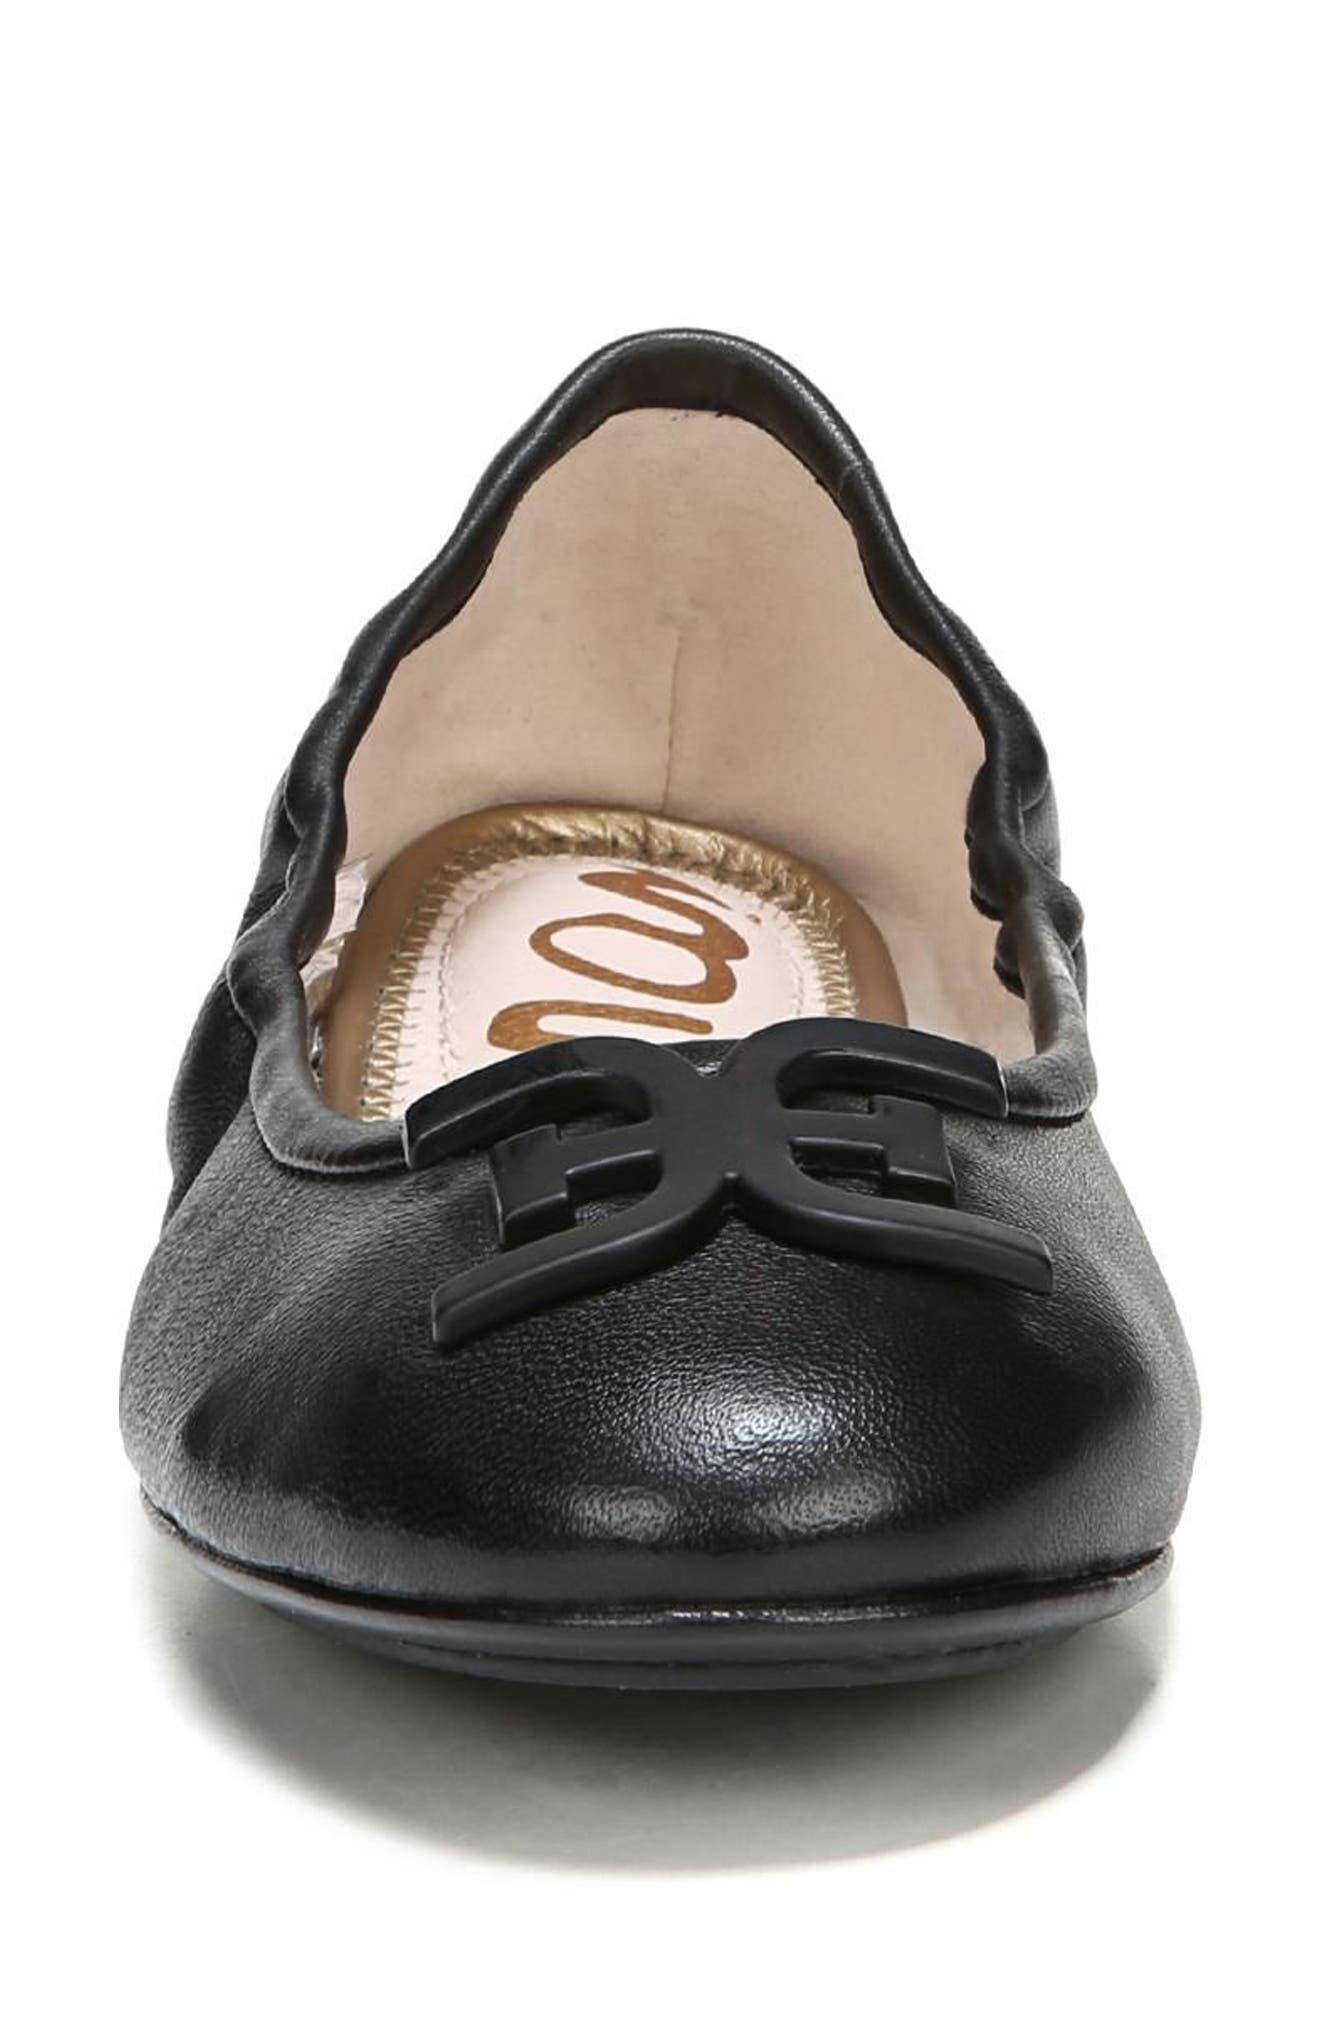 Florence Ballet Flat,                             Alternate thumbnail 4, color,                             Black Leather